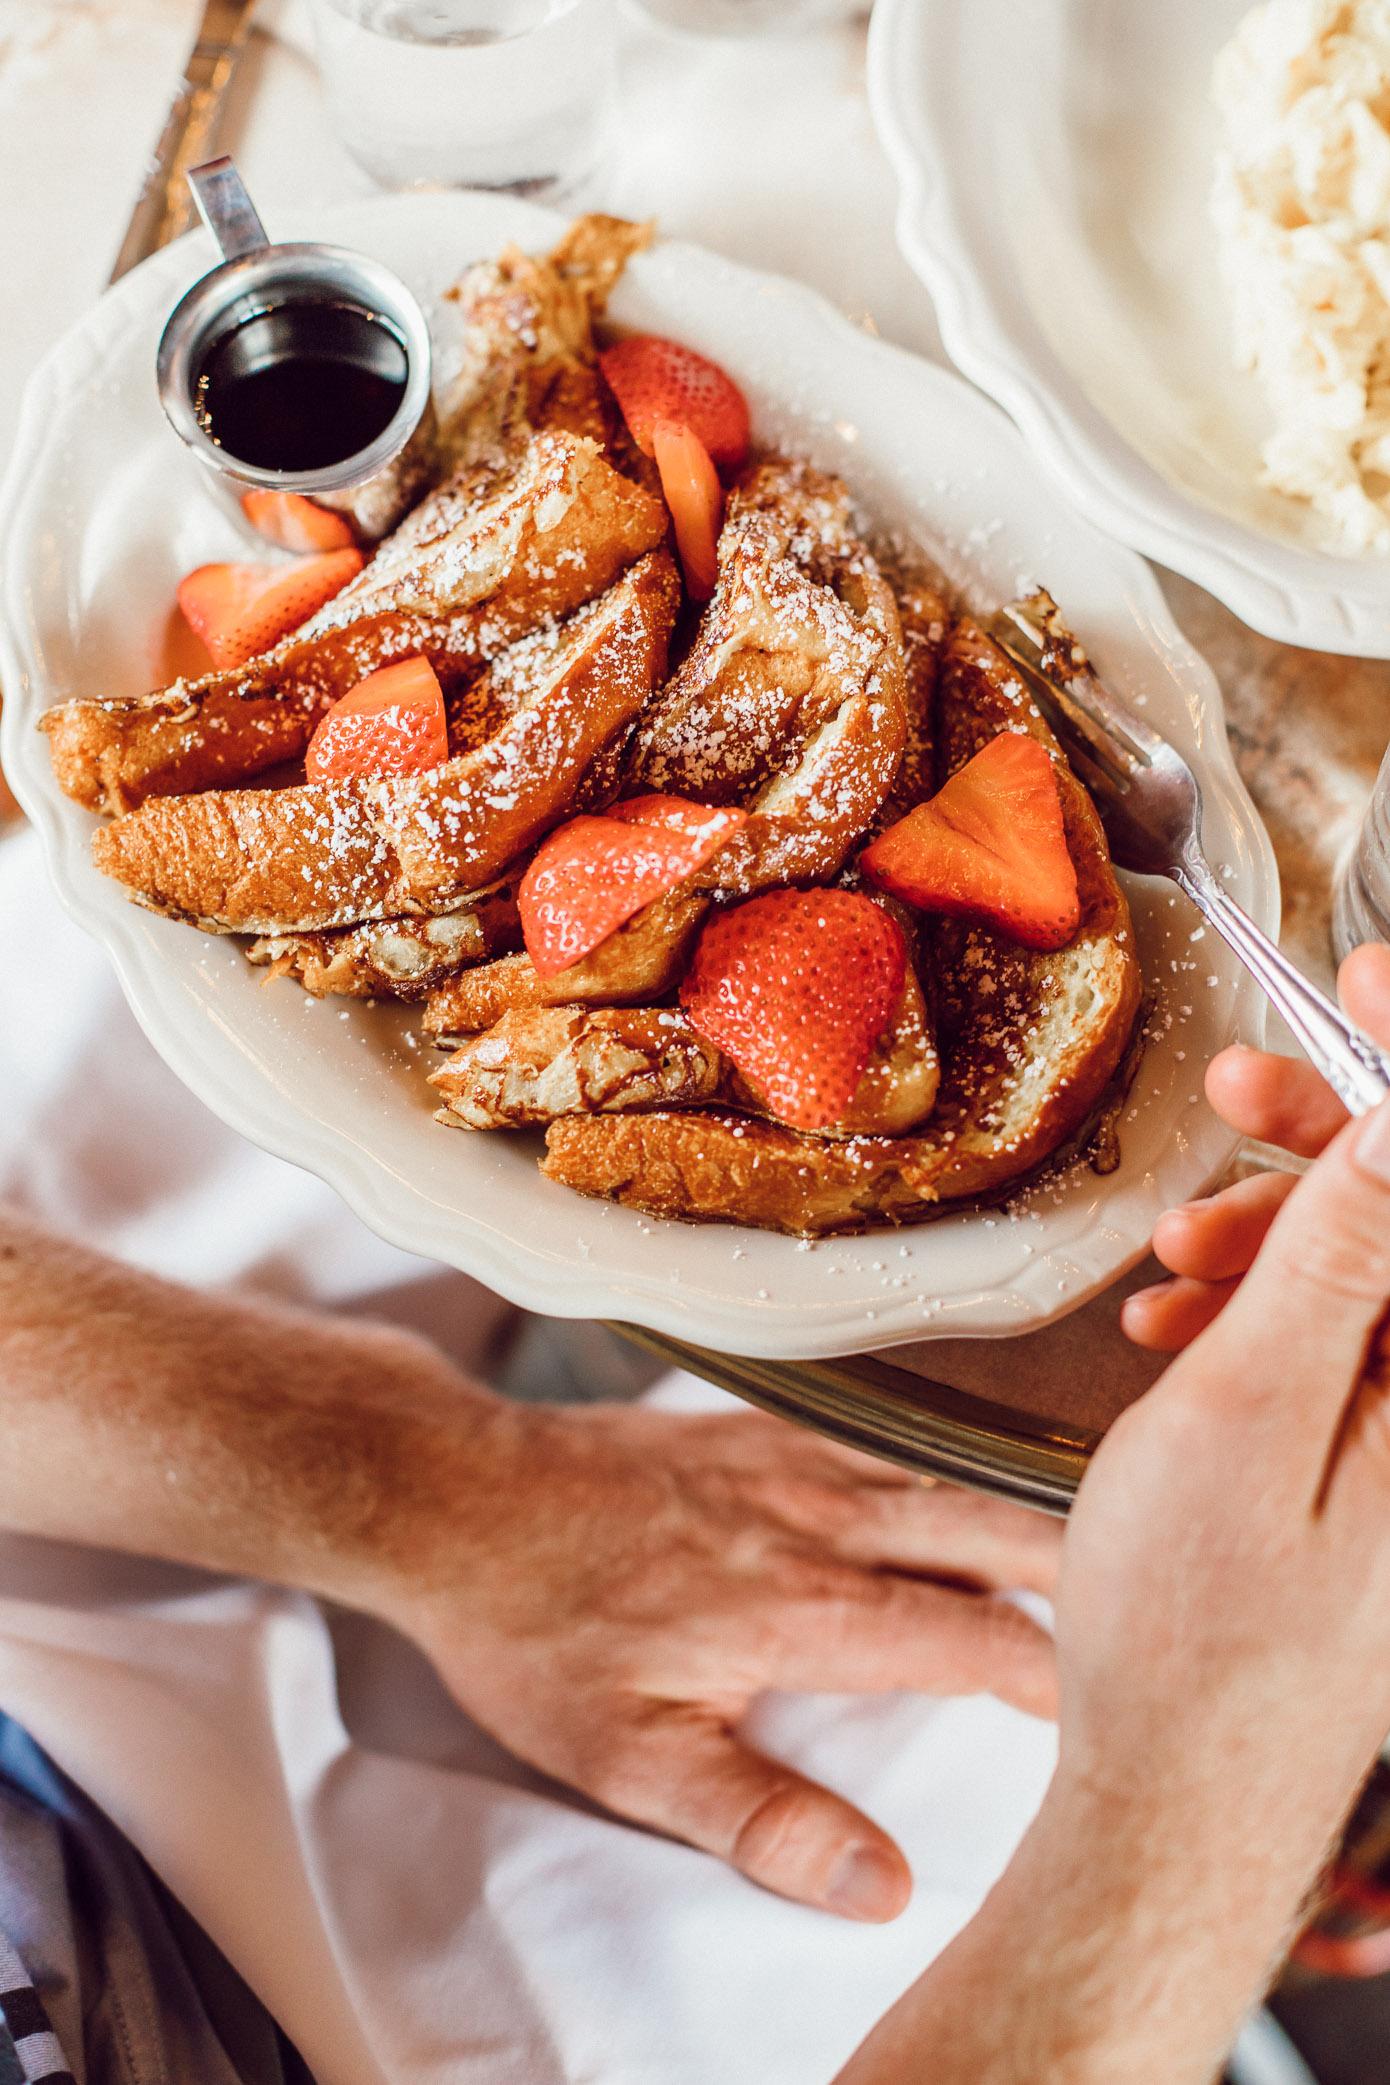 Café Intermezzo | Where to Eat in Dunwoody GA | Dunwoody GA Travel Diary | Louella Reese